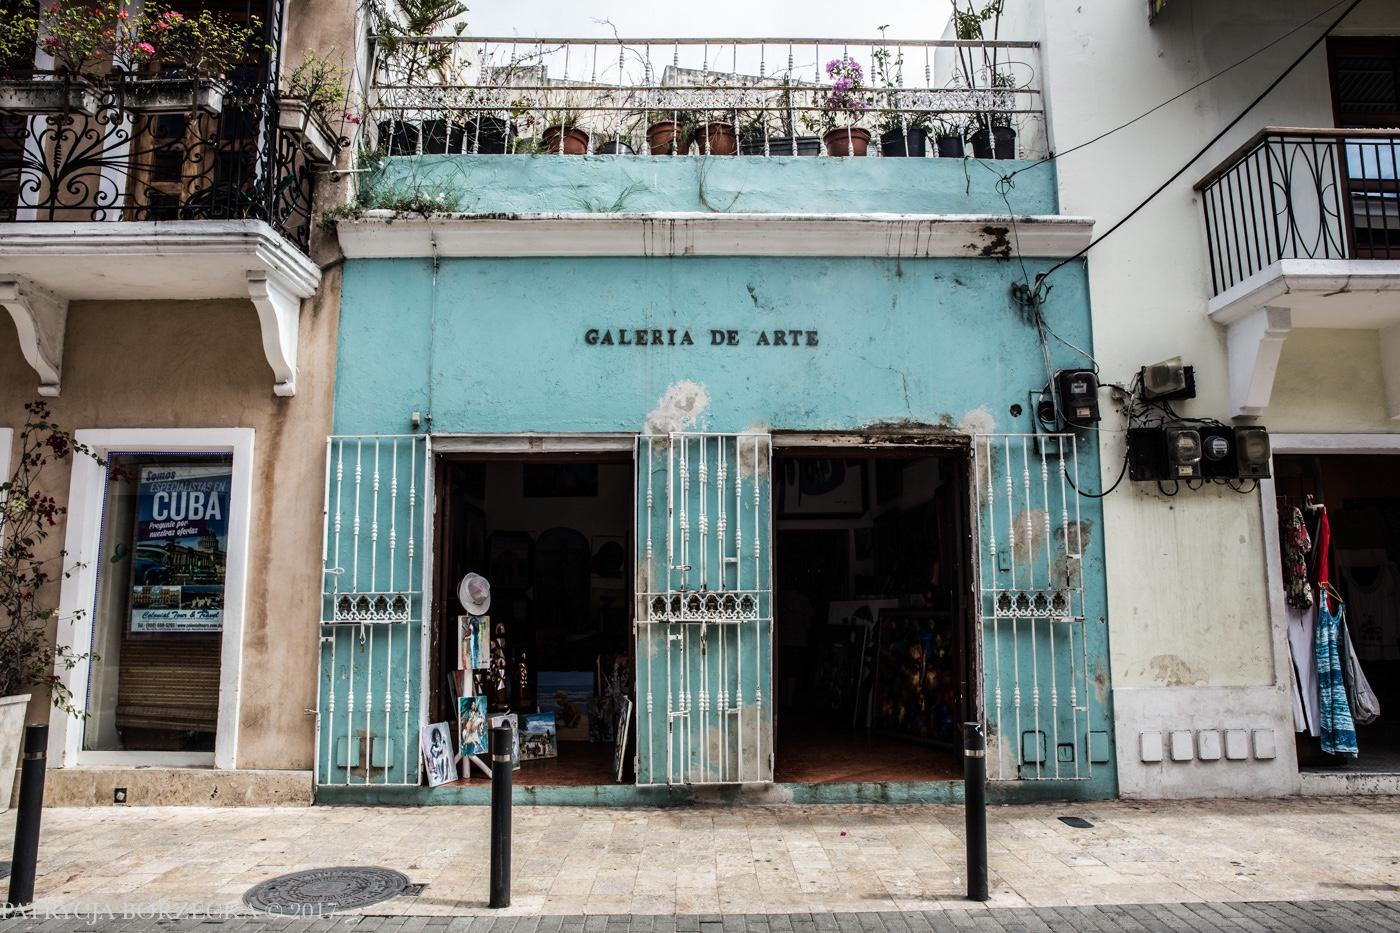 Patrycja-Borzecka-Photo-Santo-Domingo-Zona-Colonial-03